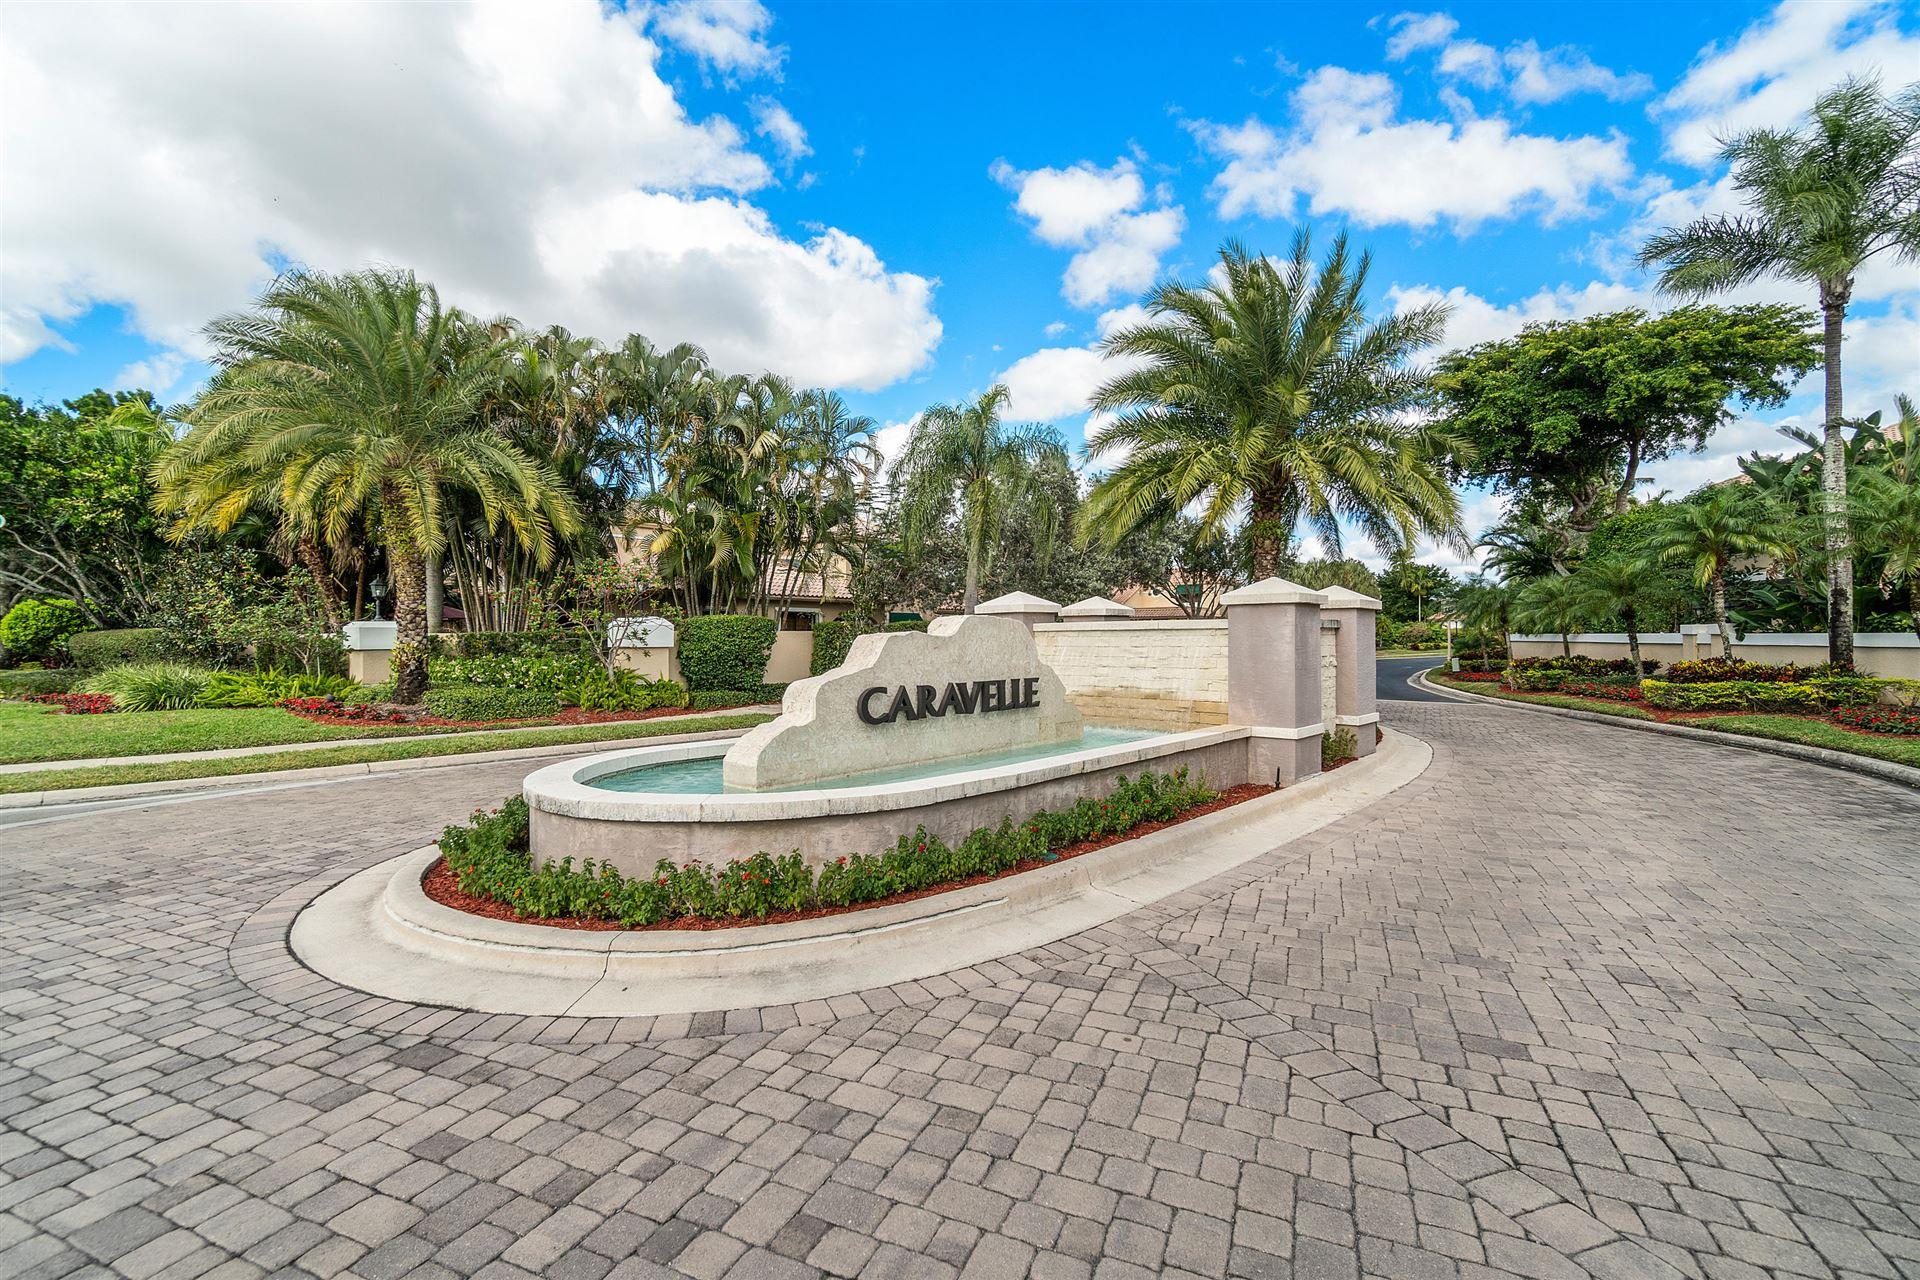 22672 Caravelle Circle, Boca Raton, FL 33433 - #: RX-10681503